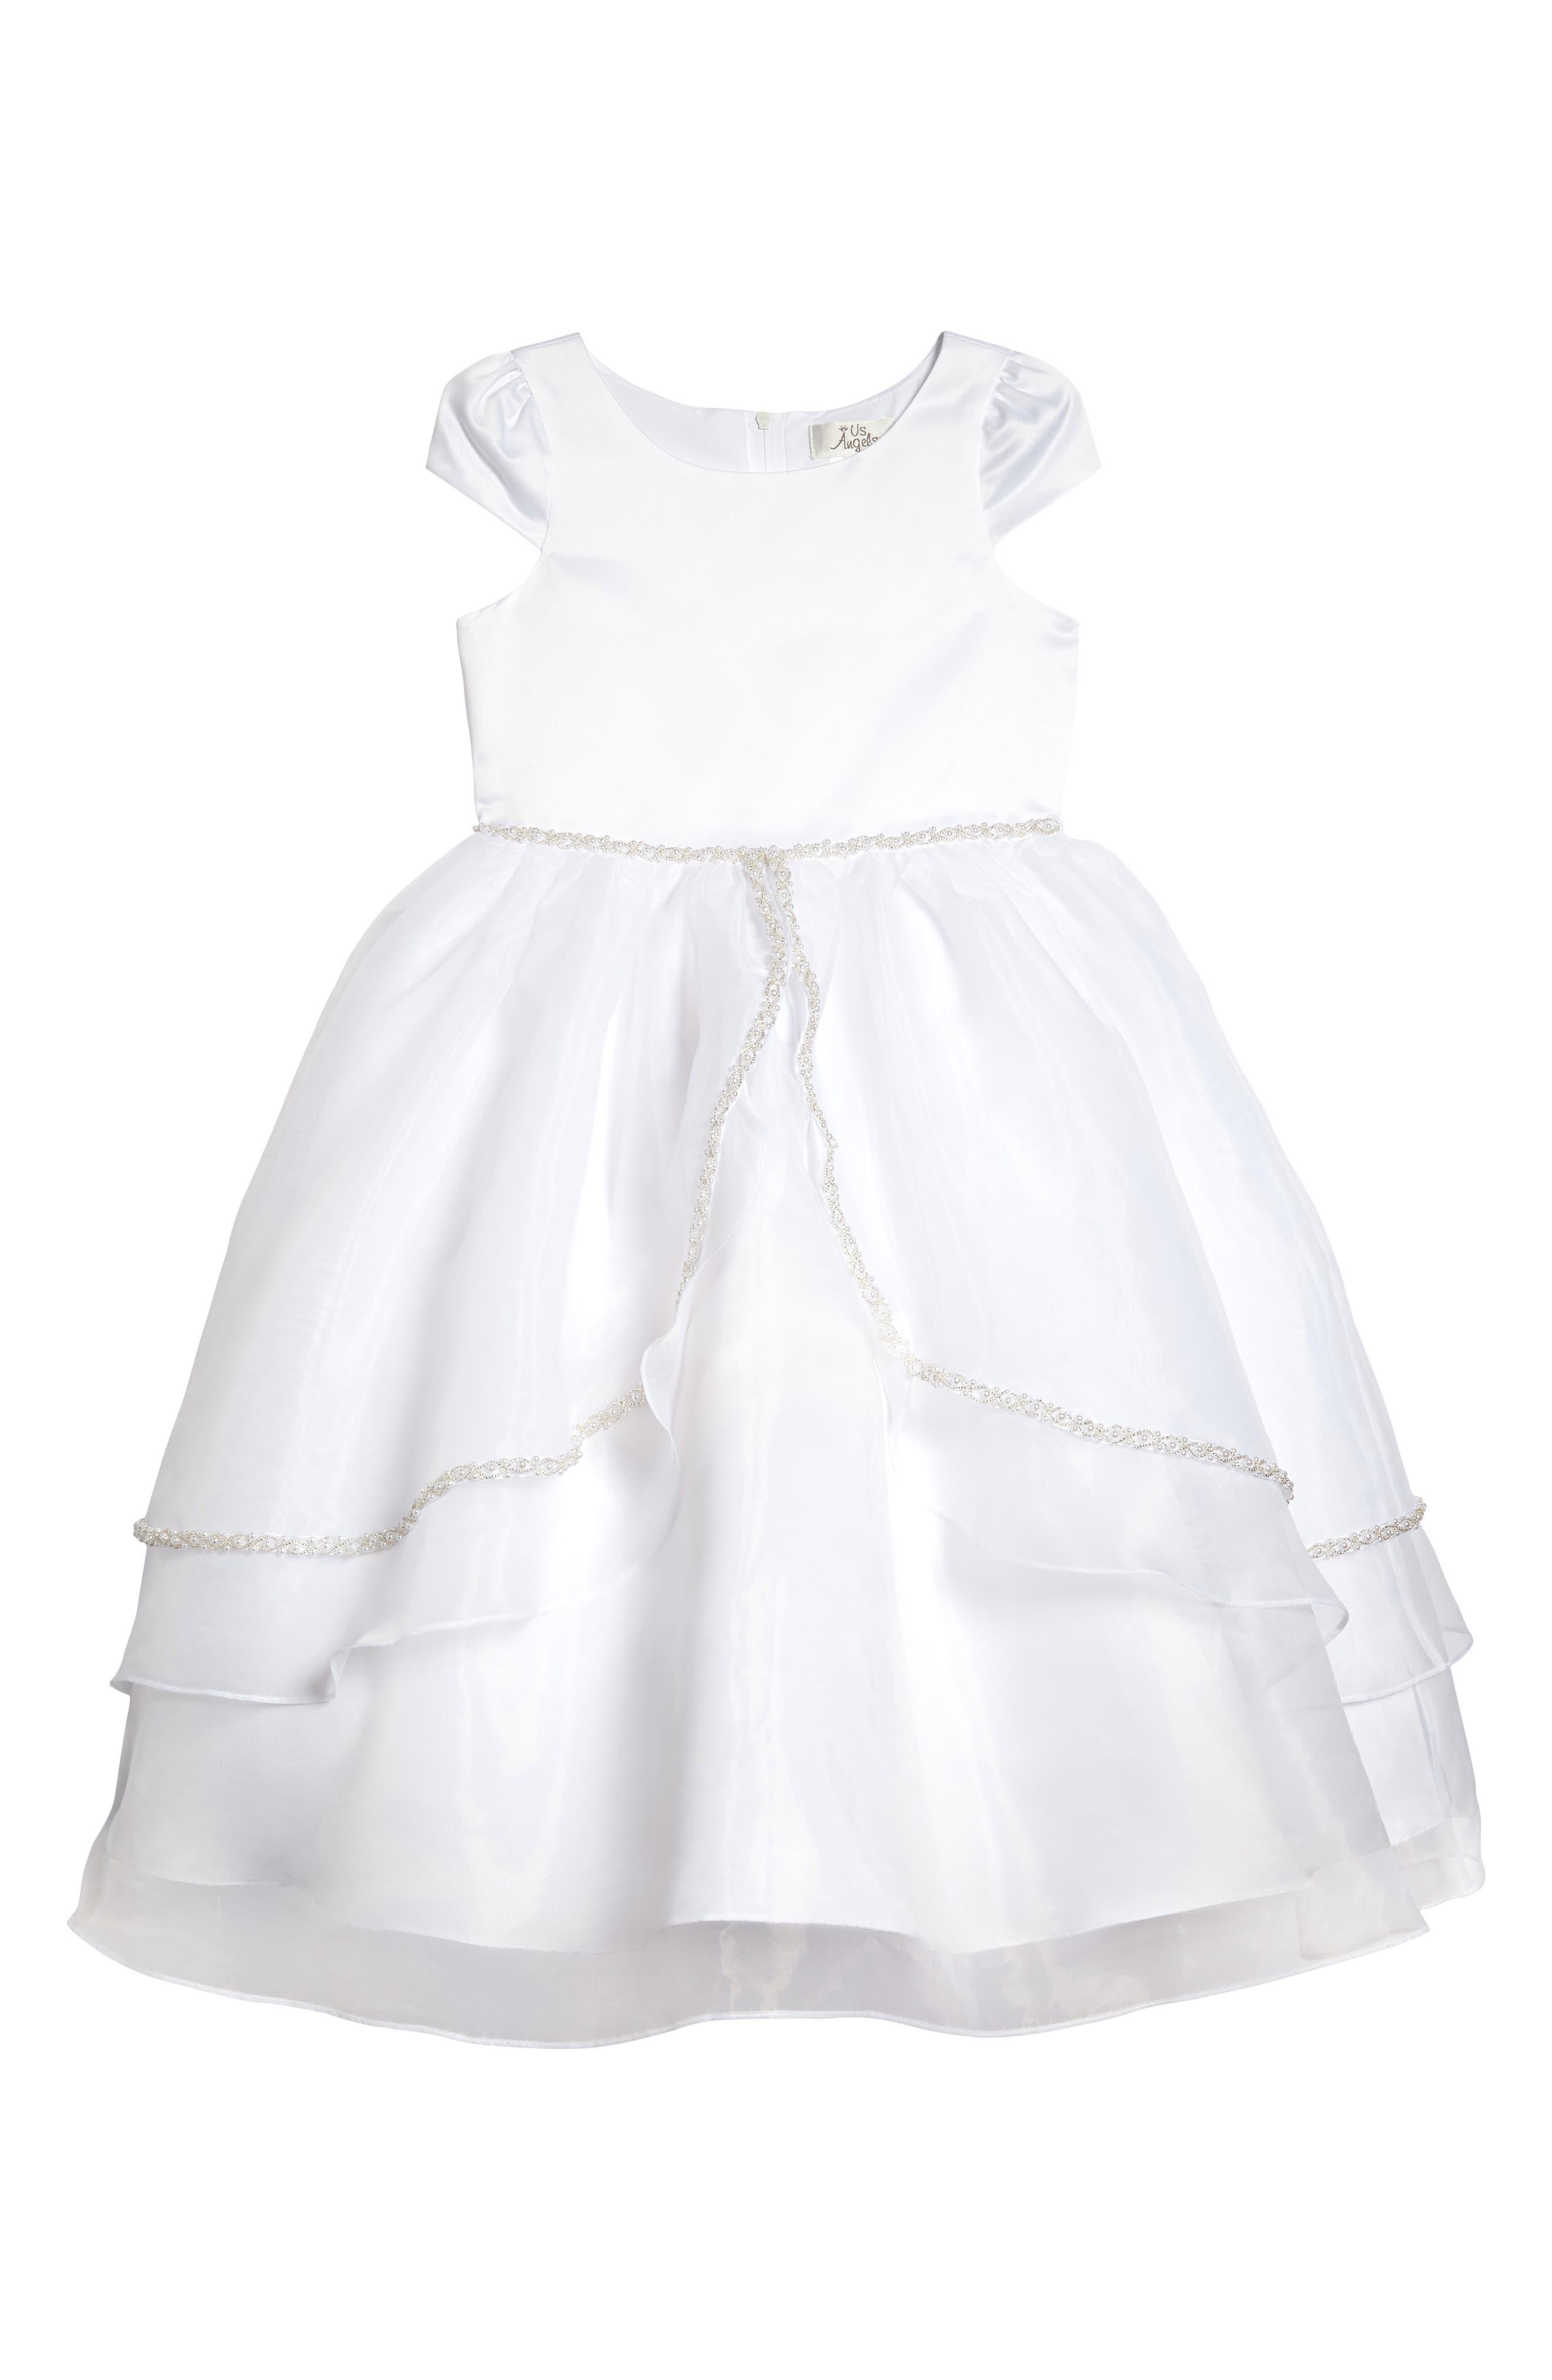 Alternate Image 1 Selected - Us Angels Satin & Organza Dress (Little Girls & Big Girls)